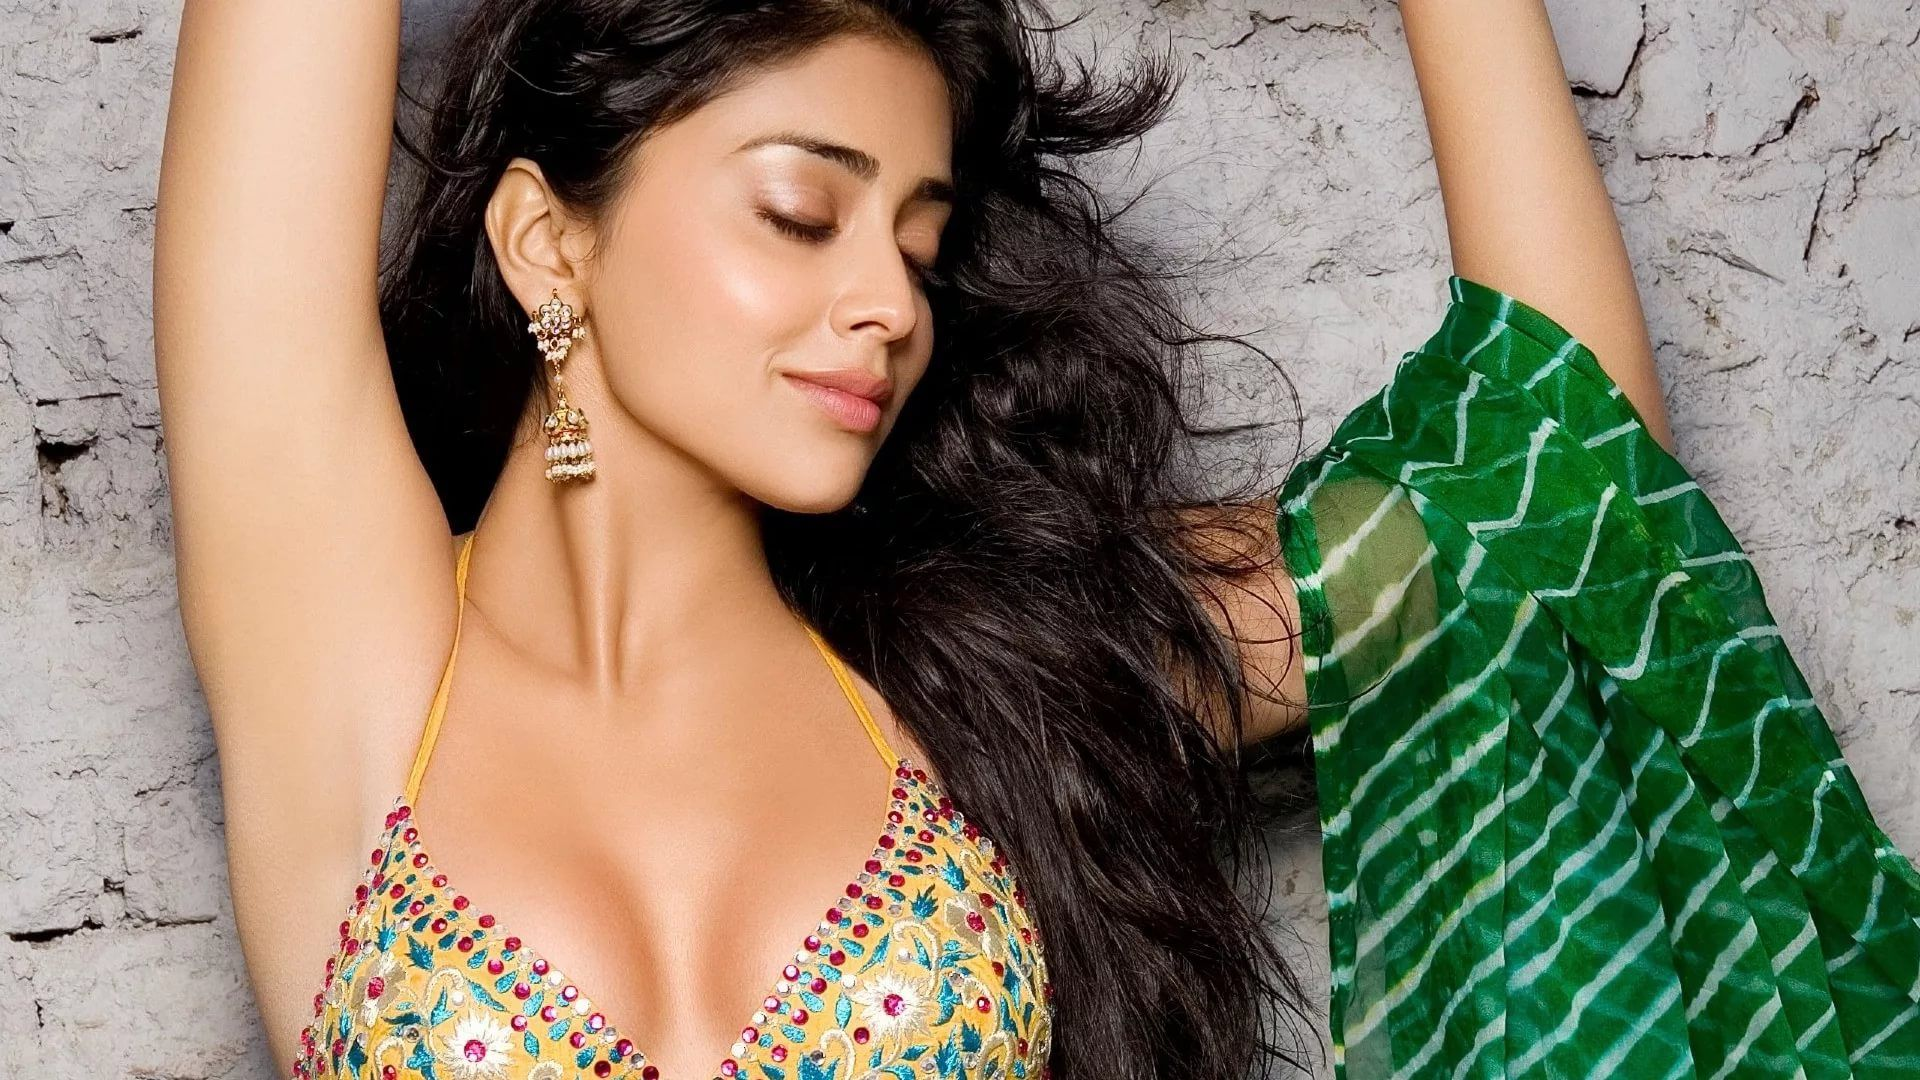 South Actress Hot High Resolution wallpaper